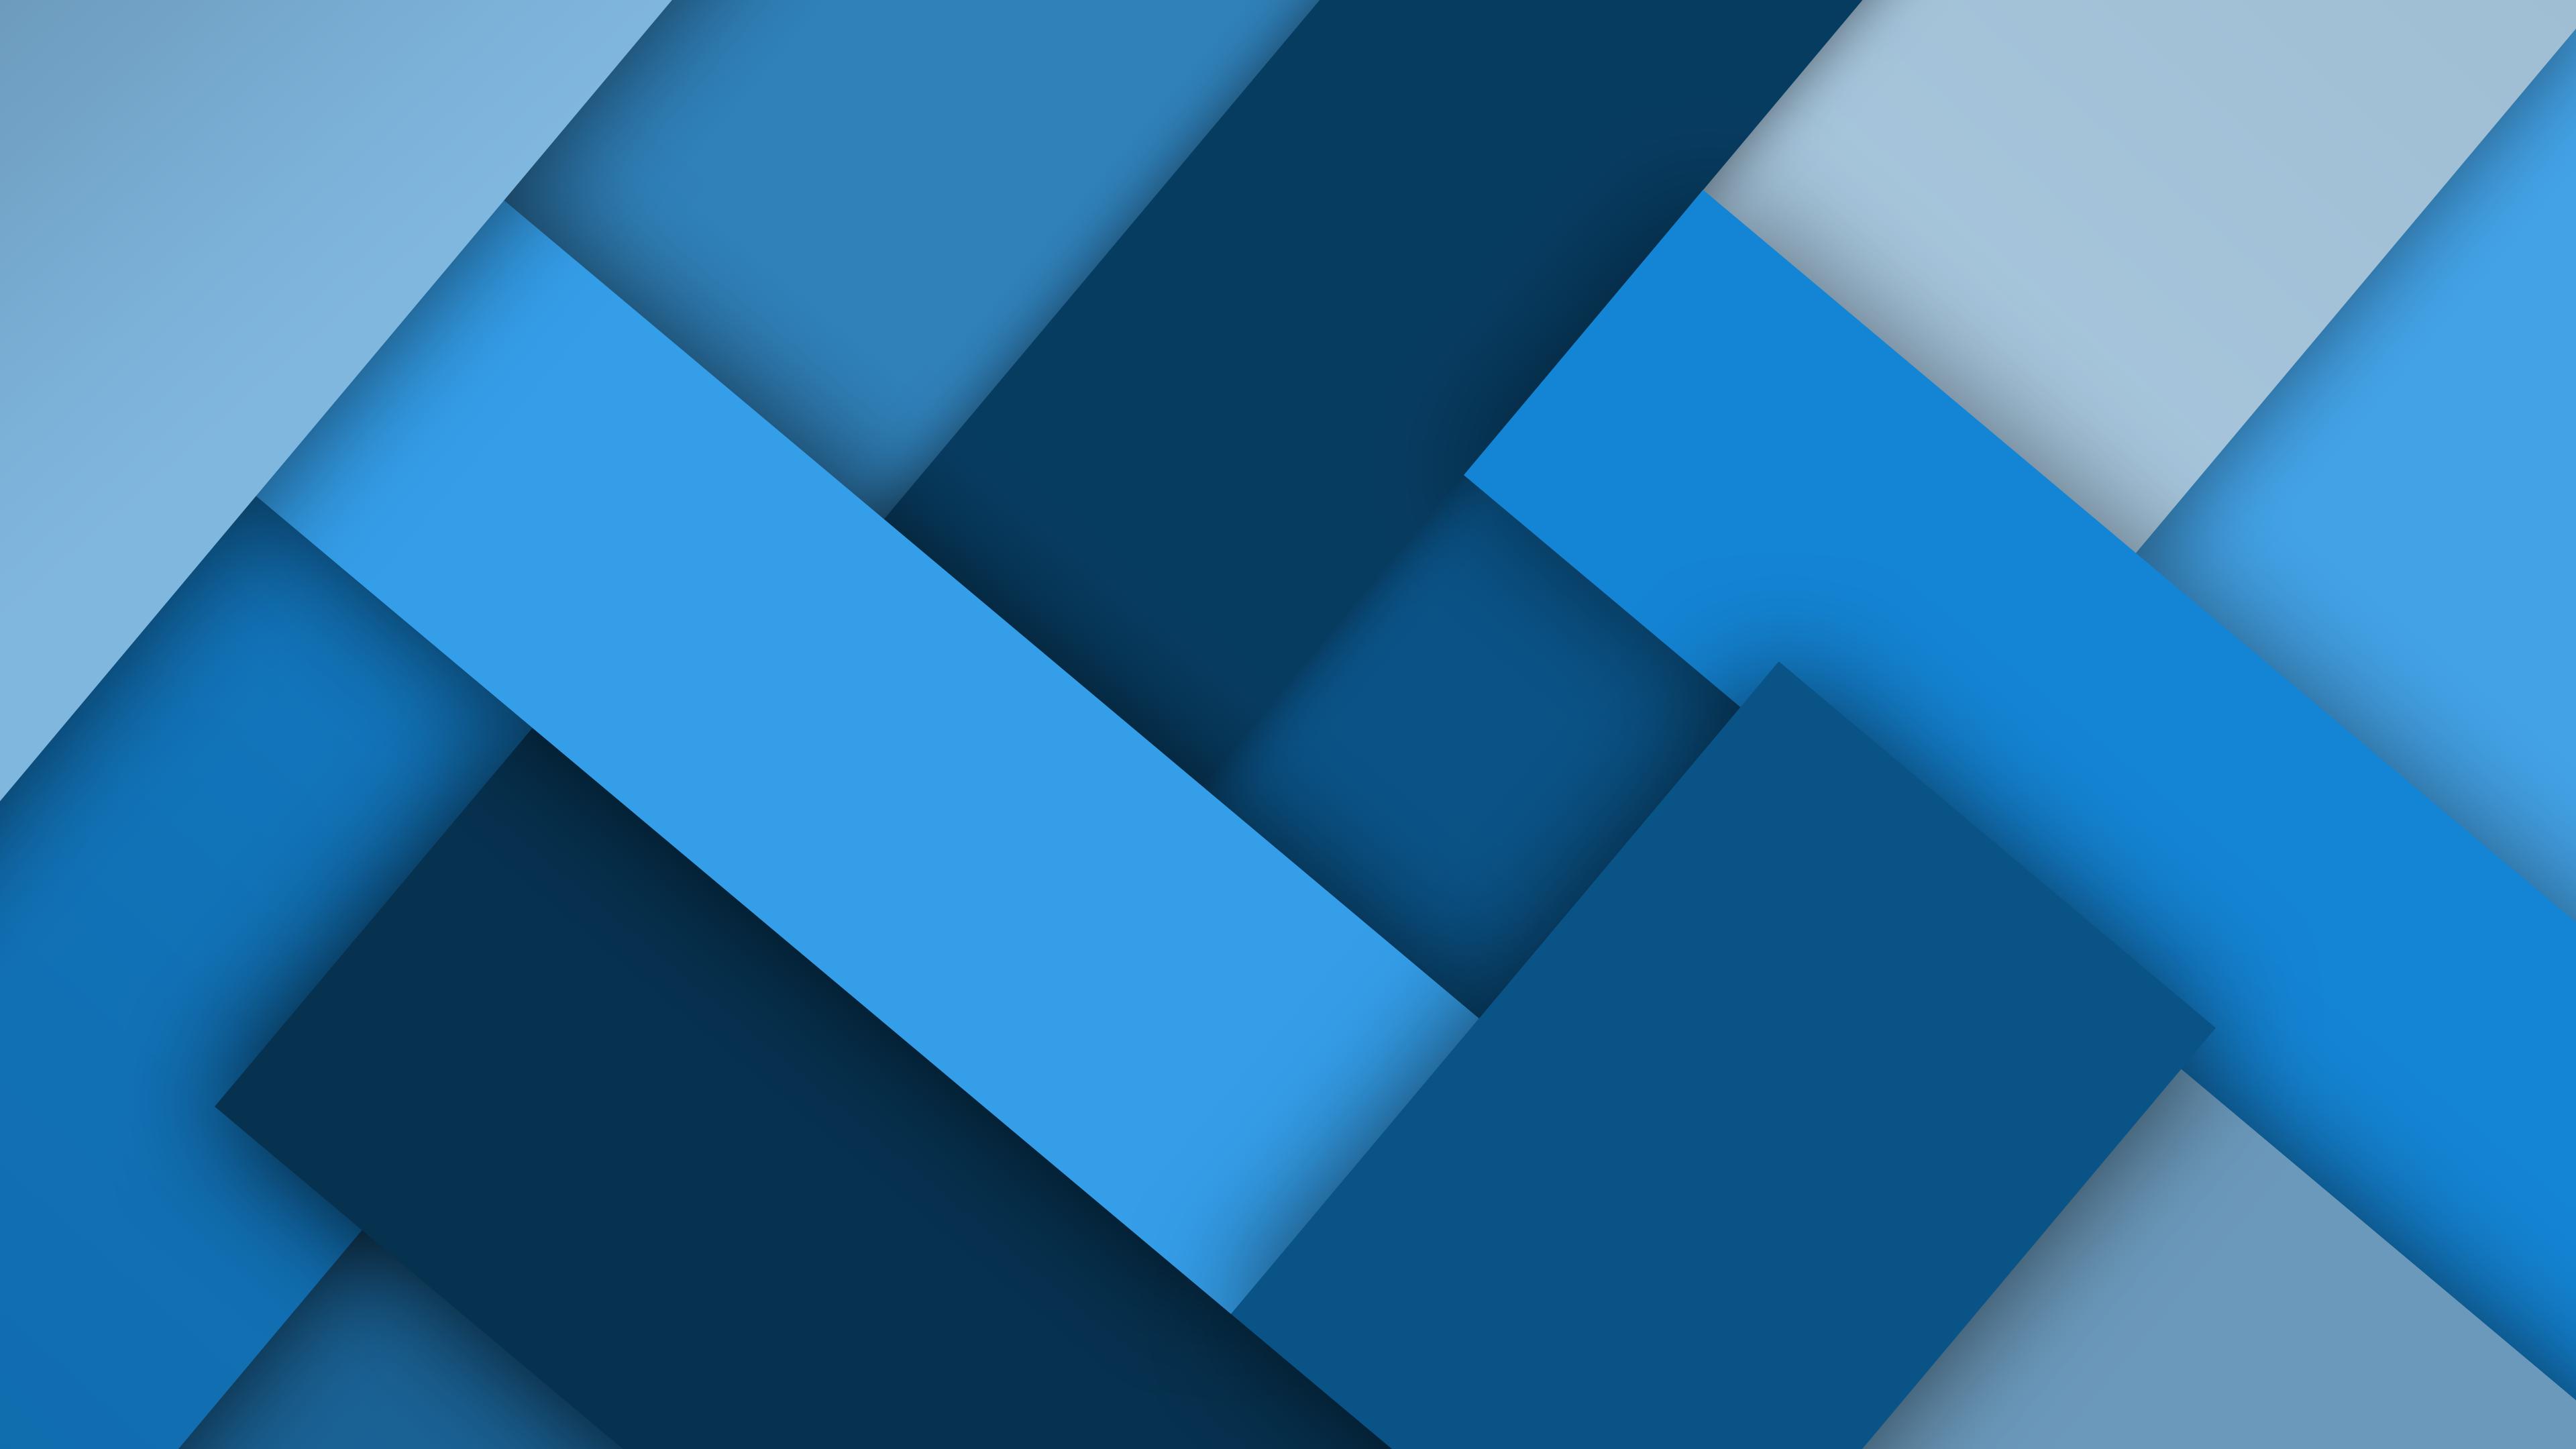 Blocks Blue Fonds D Ecran Arrieres Plan 3840x2160 Id 559116 Arriere Plan Fond Ecran Ecran